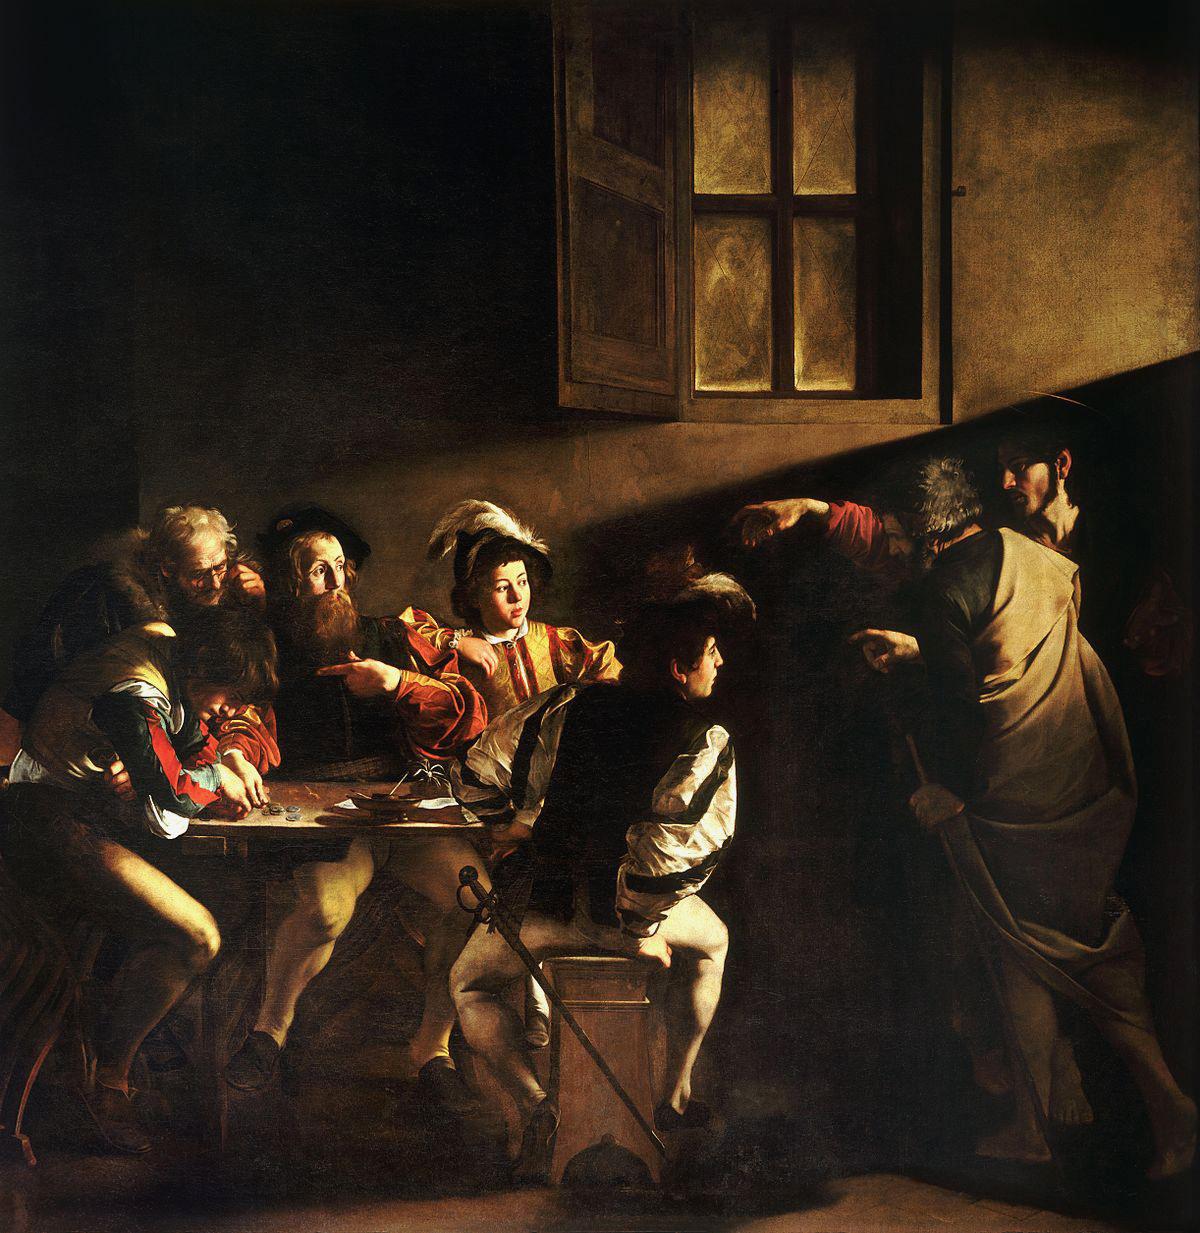 11 The_Calling_of_Saint_Matthew-Caravaggo_